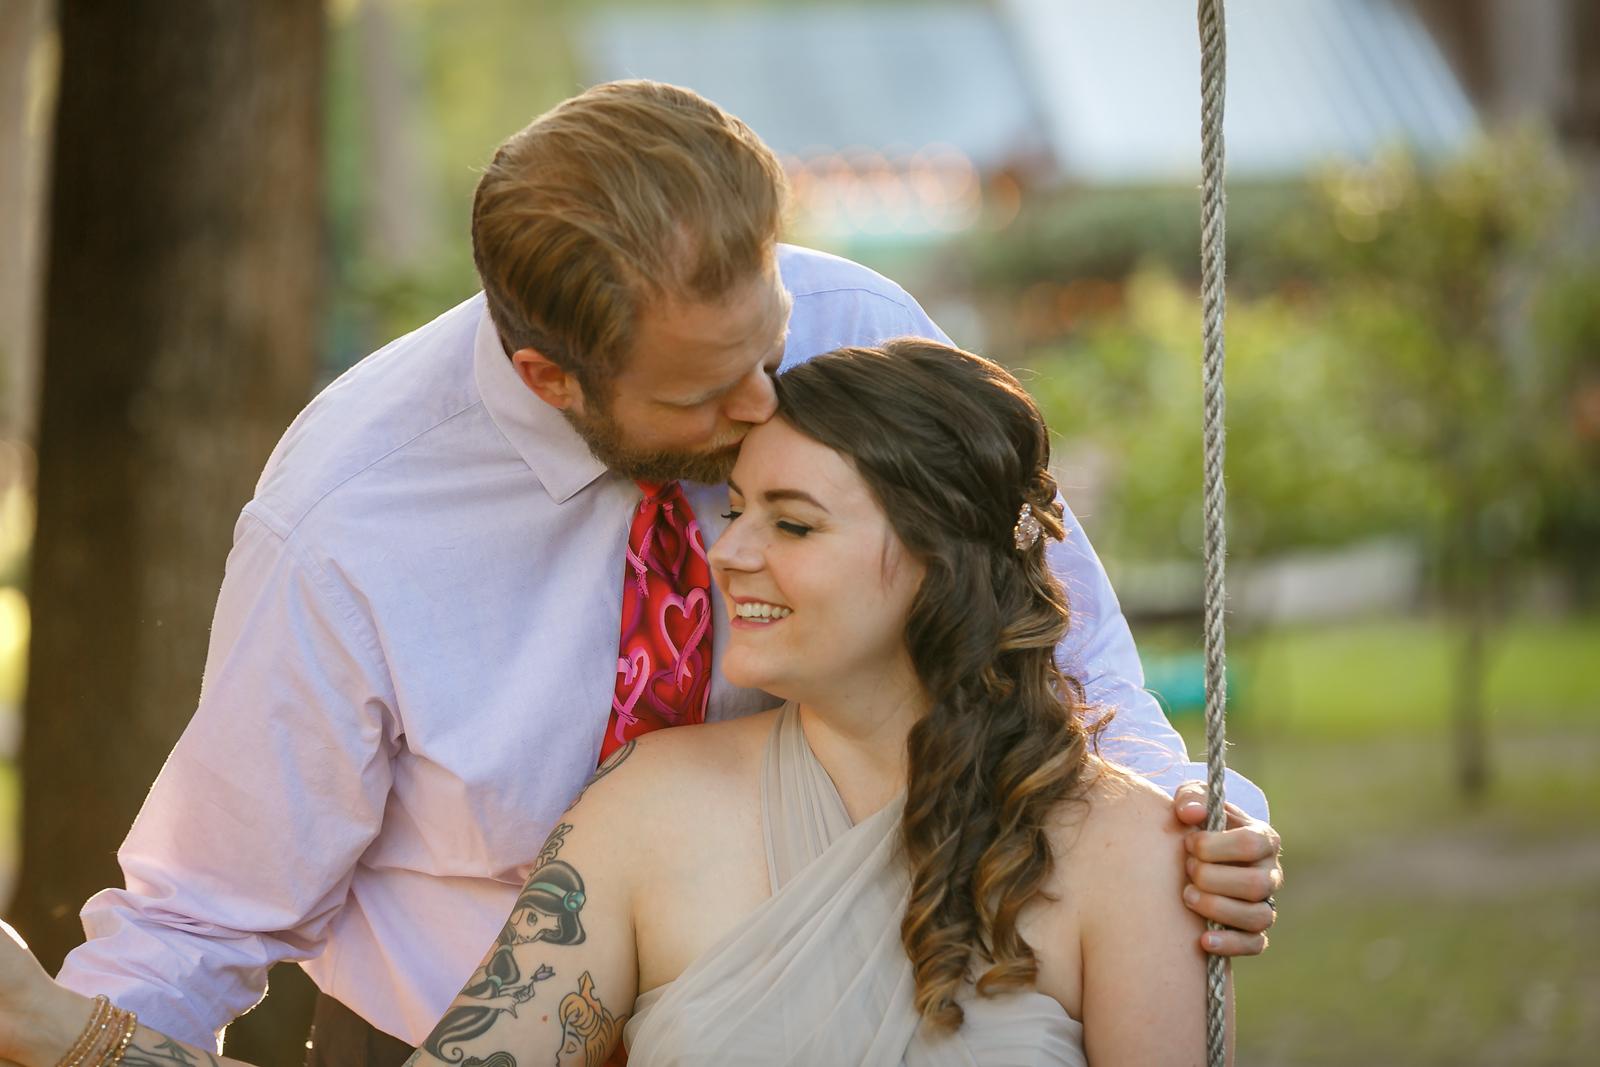 CAP2017-MadisonKyle-WEDDING-Giselle-TuckersFarmhouse-1046